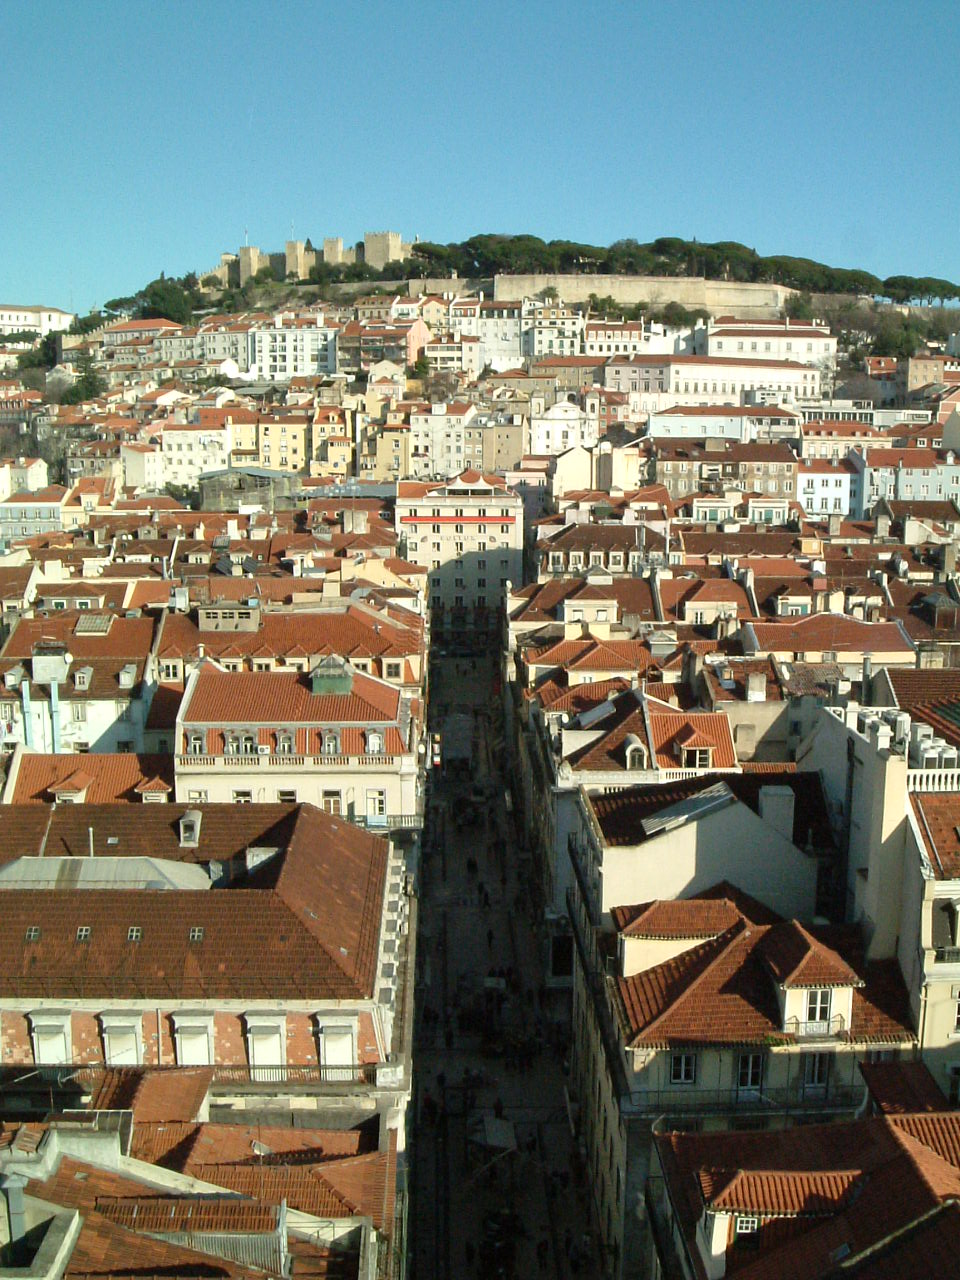 http://pennaevaligia.it/wp-content/uploads/2016/05/Lisbona-alto-1.jpg